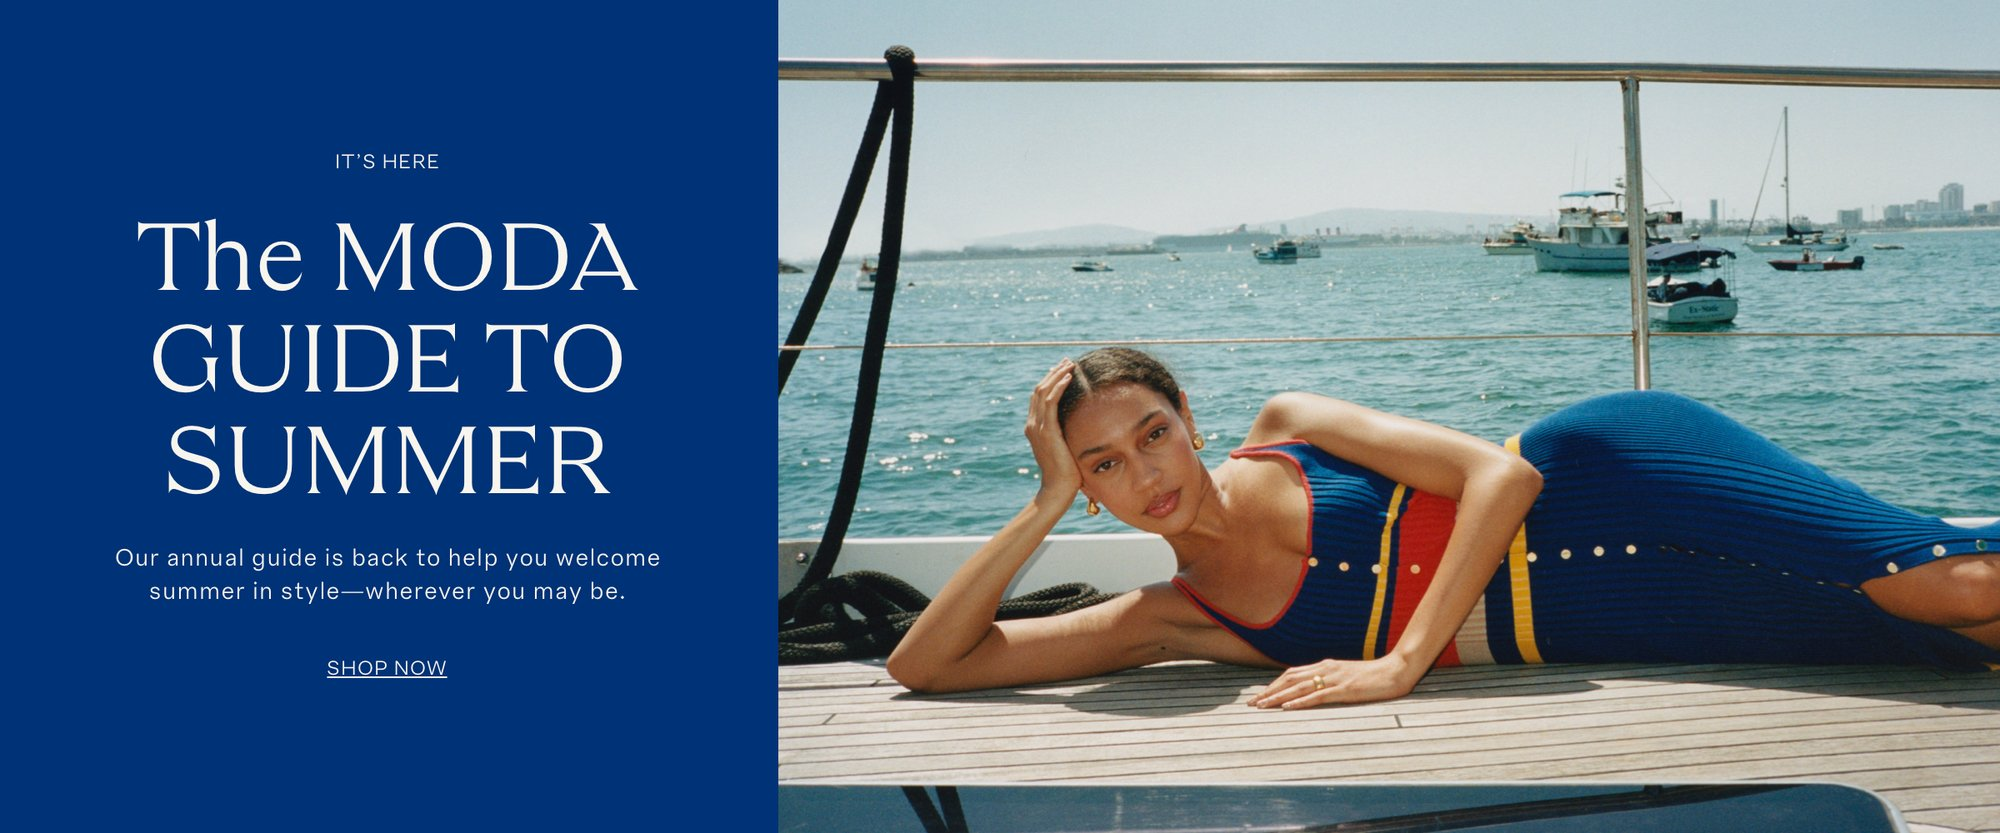 Moda Guide to Summer